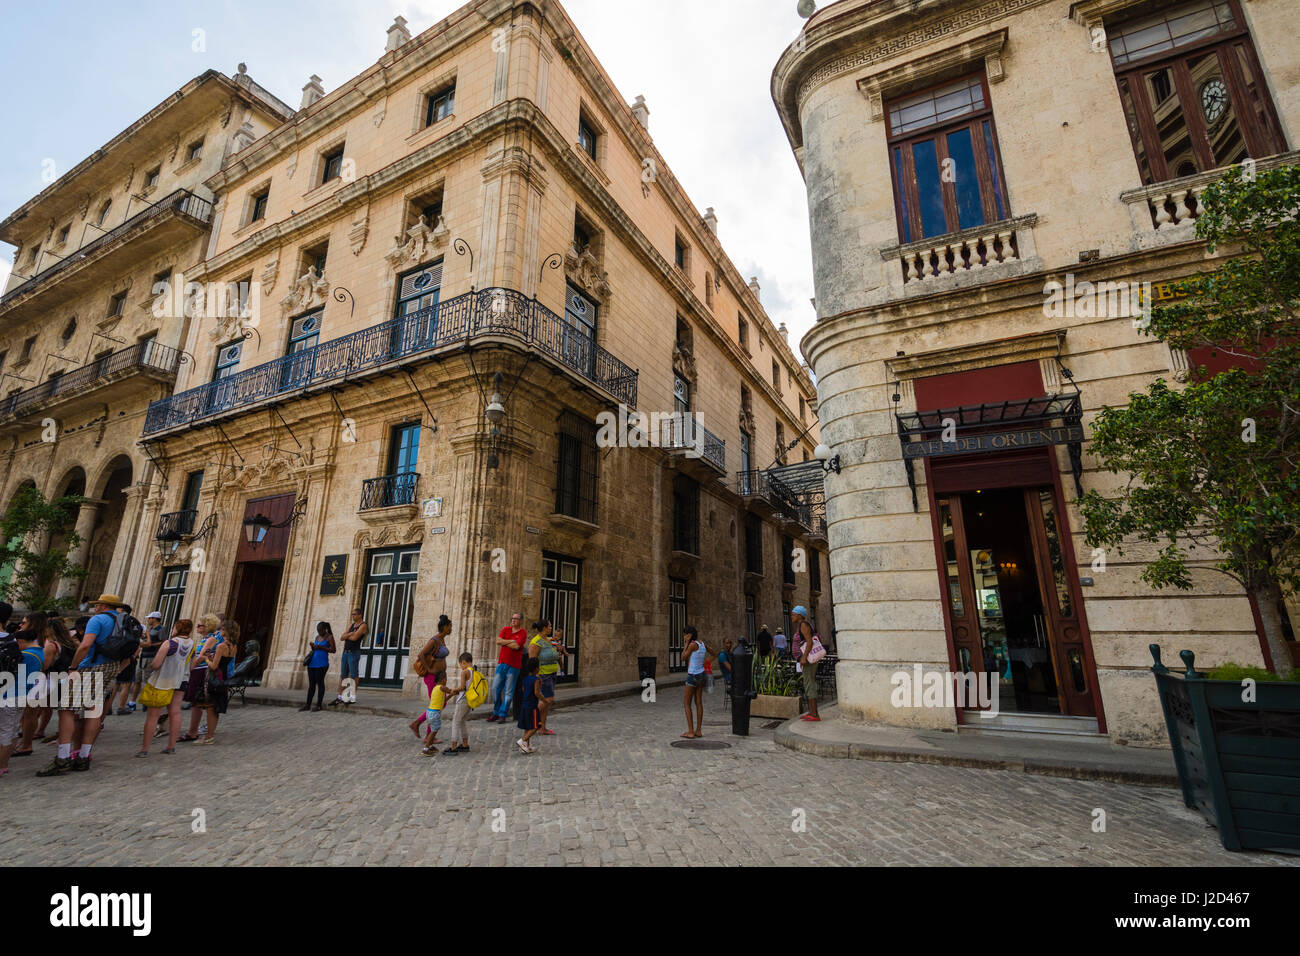 Cuba. Havana. Old Havana. Tourists and locals mix on the cobbled streets. - Stock-Bilder